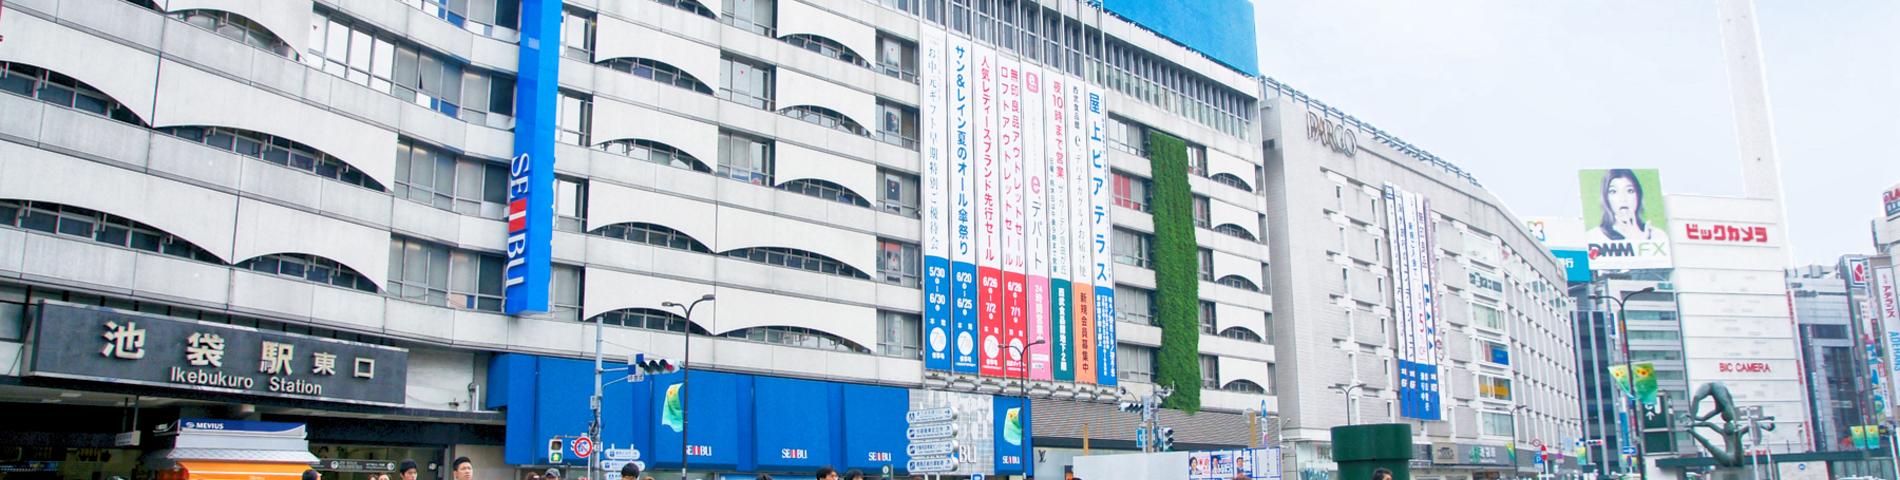 ISI Language School - Ikebukuro Campus afbeelding 1